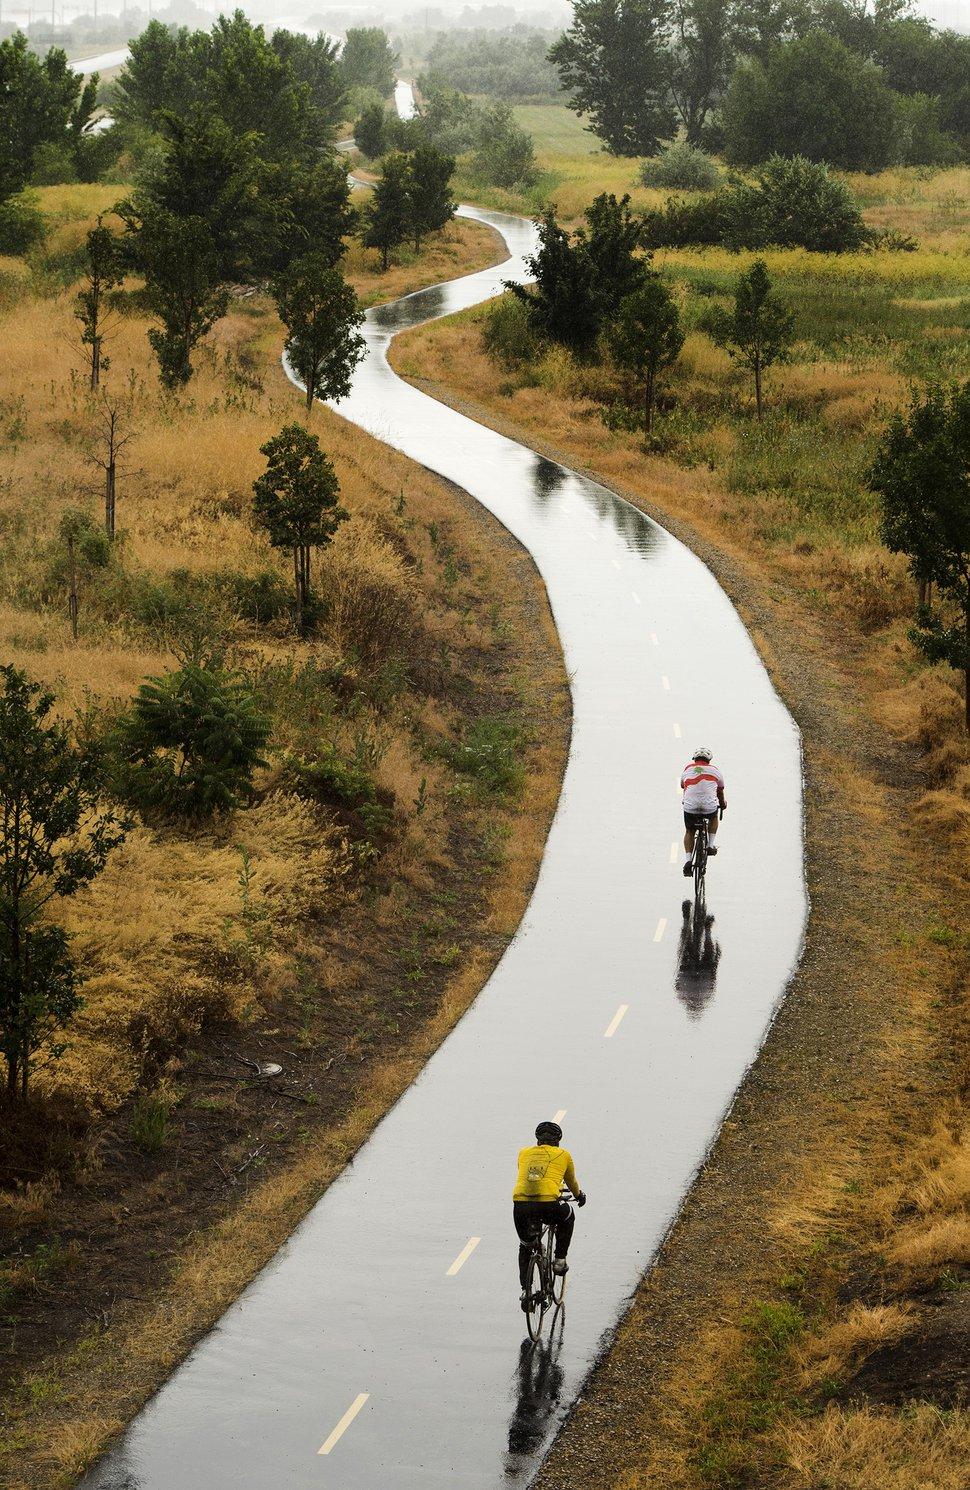 (Rick Egan | Tribune file photo) Cyclists ride the Legacy Parkway Trail in Farmington on a rainy Sunday morning, July 5, 2015.